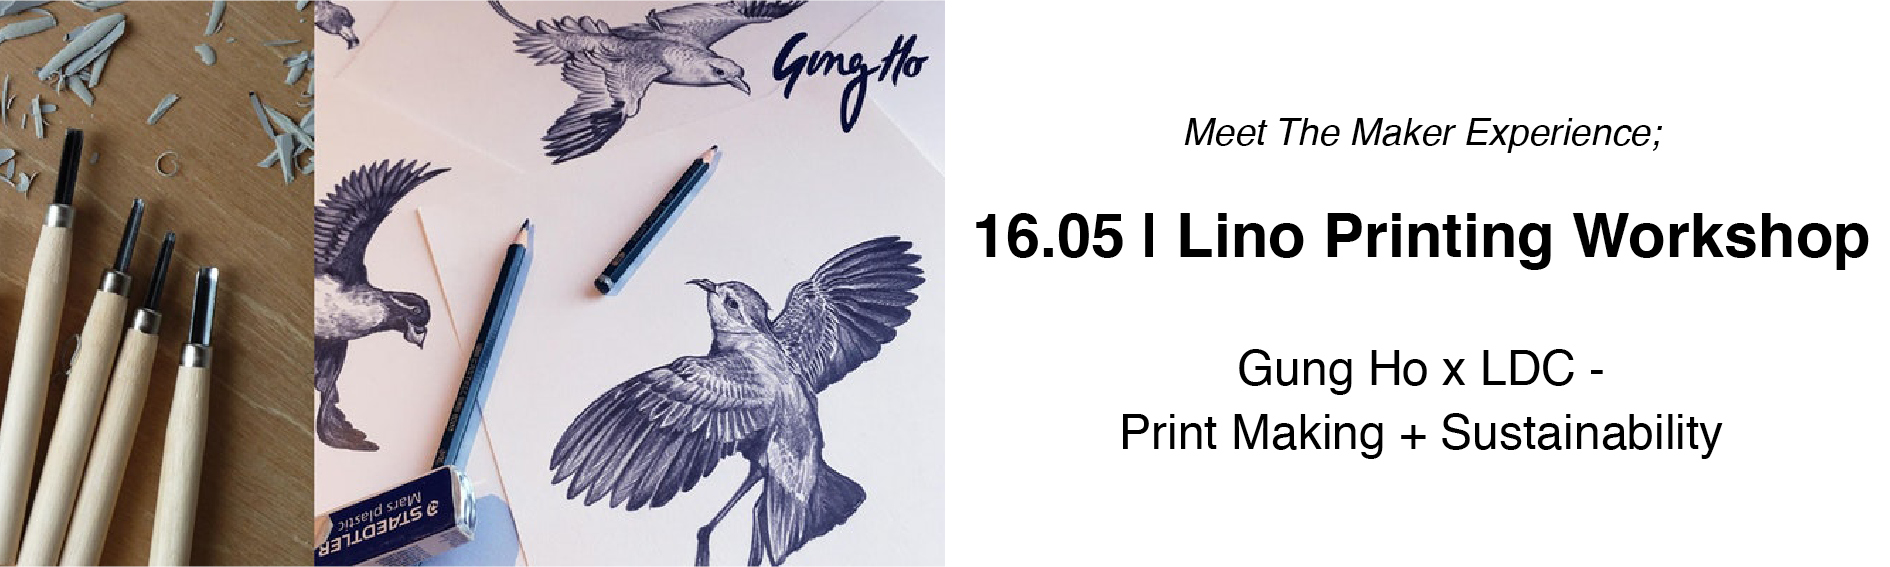 Gung Ho x LDC Lino printing workshop